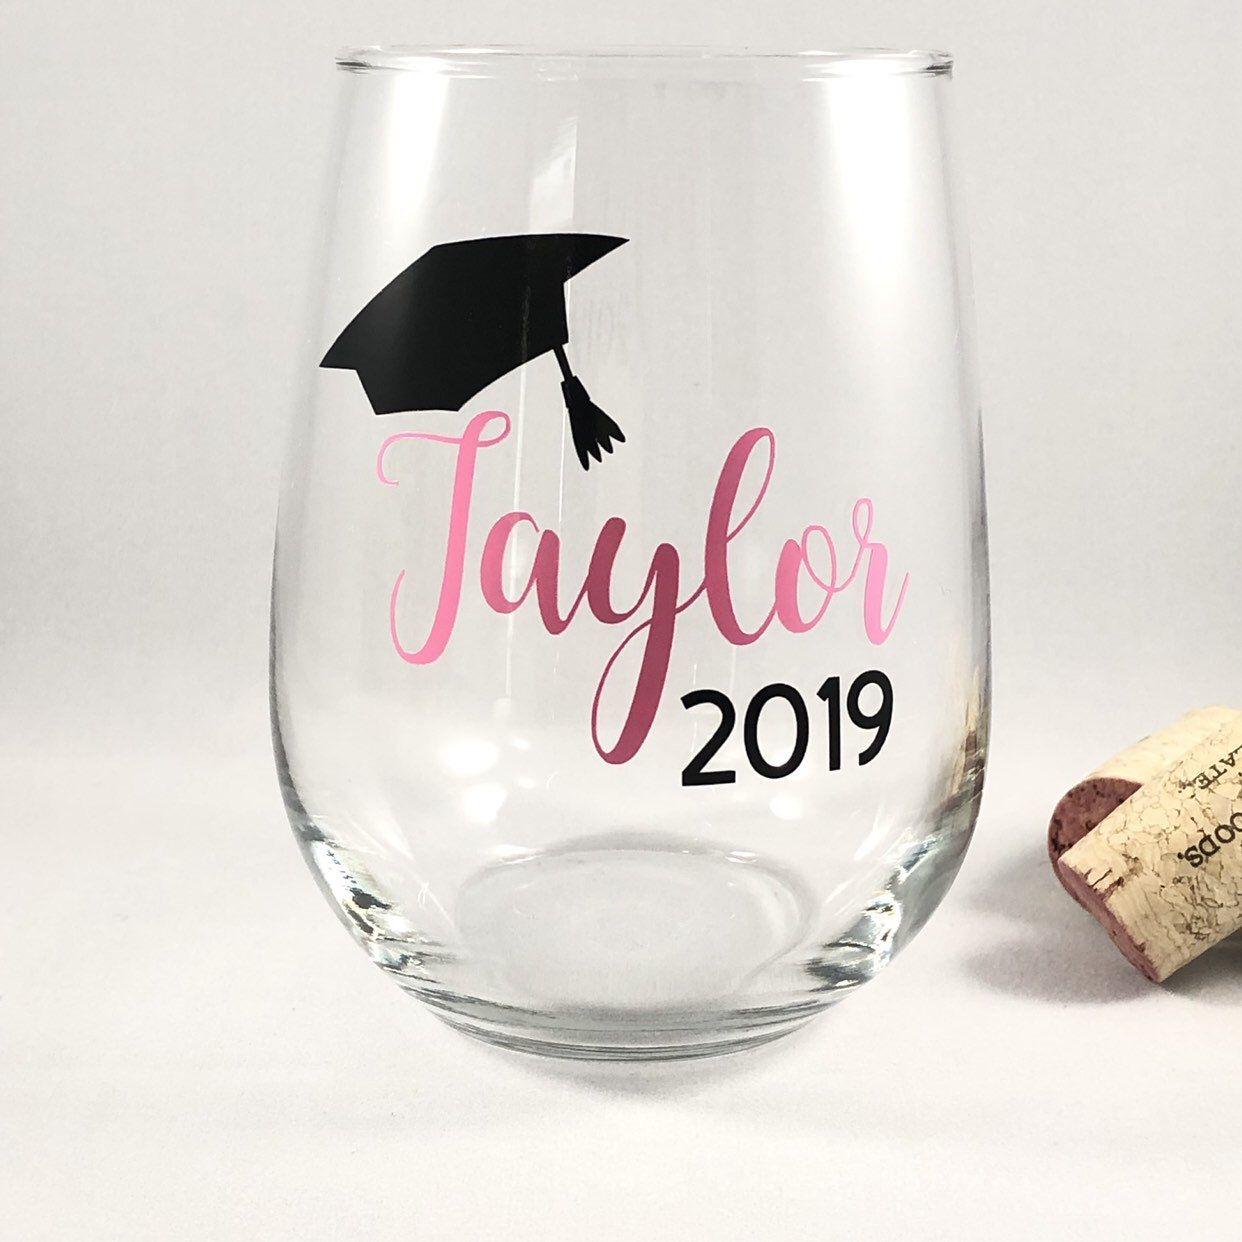 College Graduation Gift Idea/Graduation Gift/Graduation Wine Glass/Personalized Graduation/Class of 2020/Funny Graduation Gift